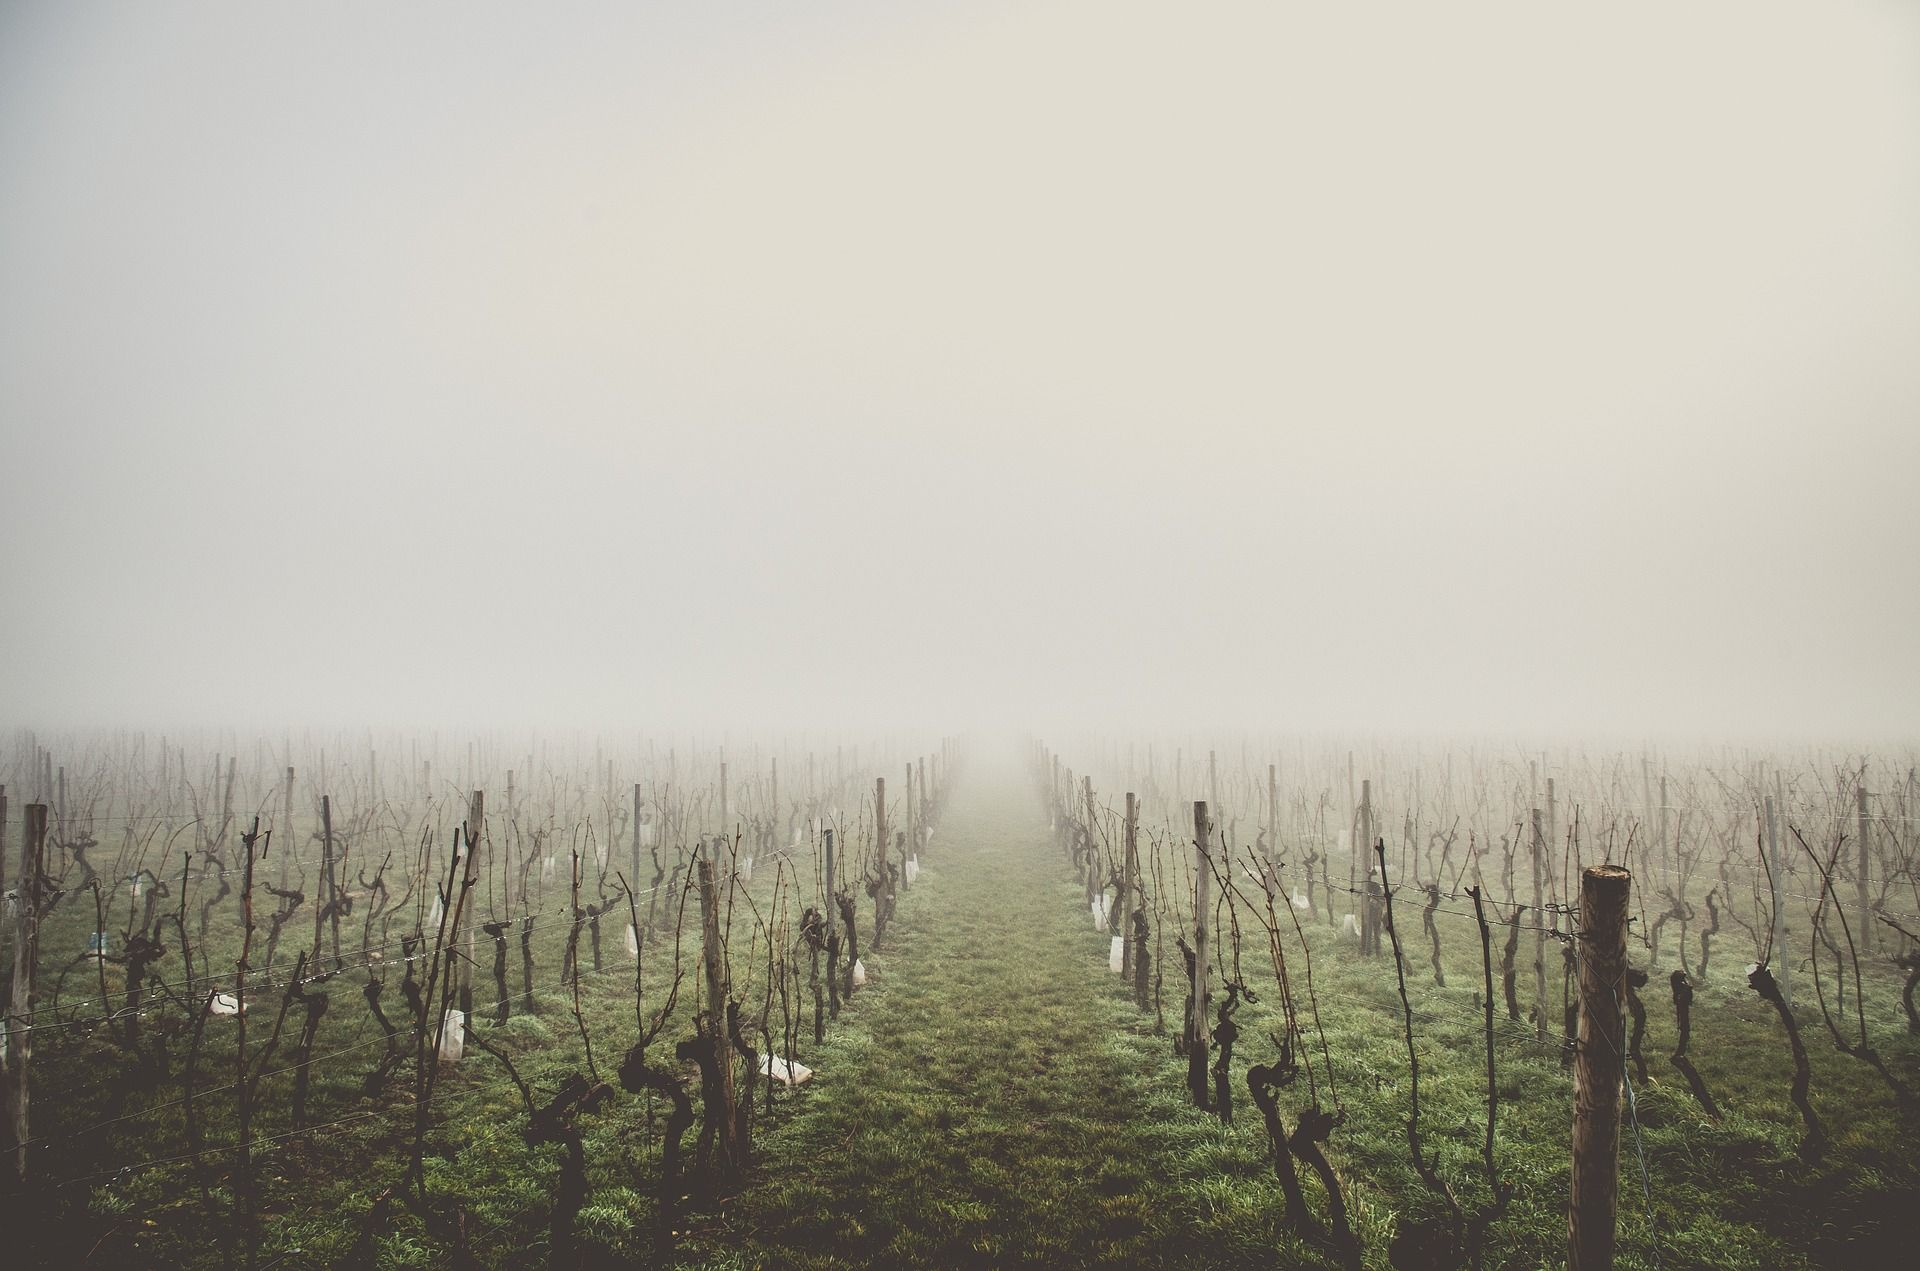 Vineyards in fog; WSET Level 2 exam